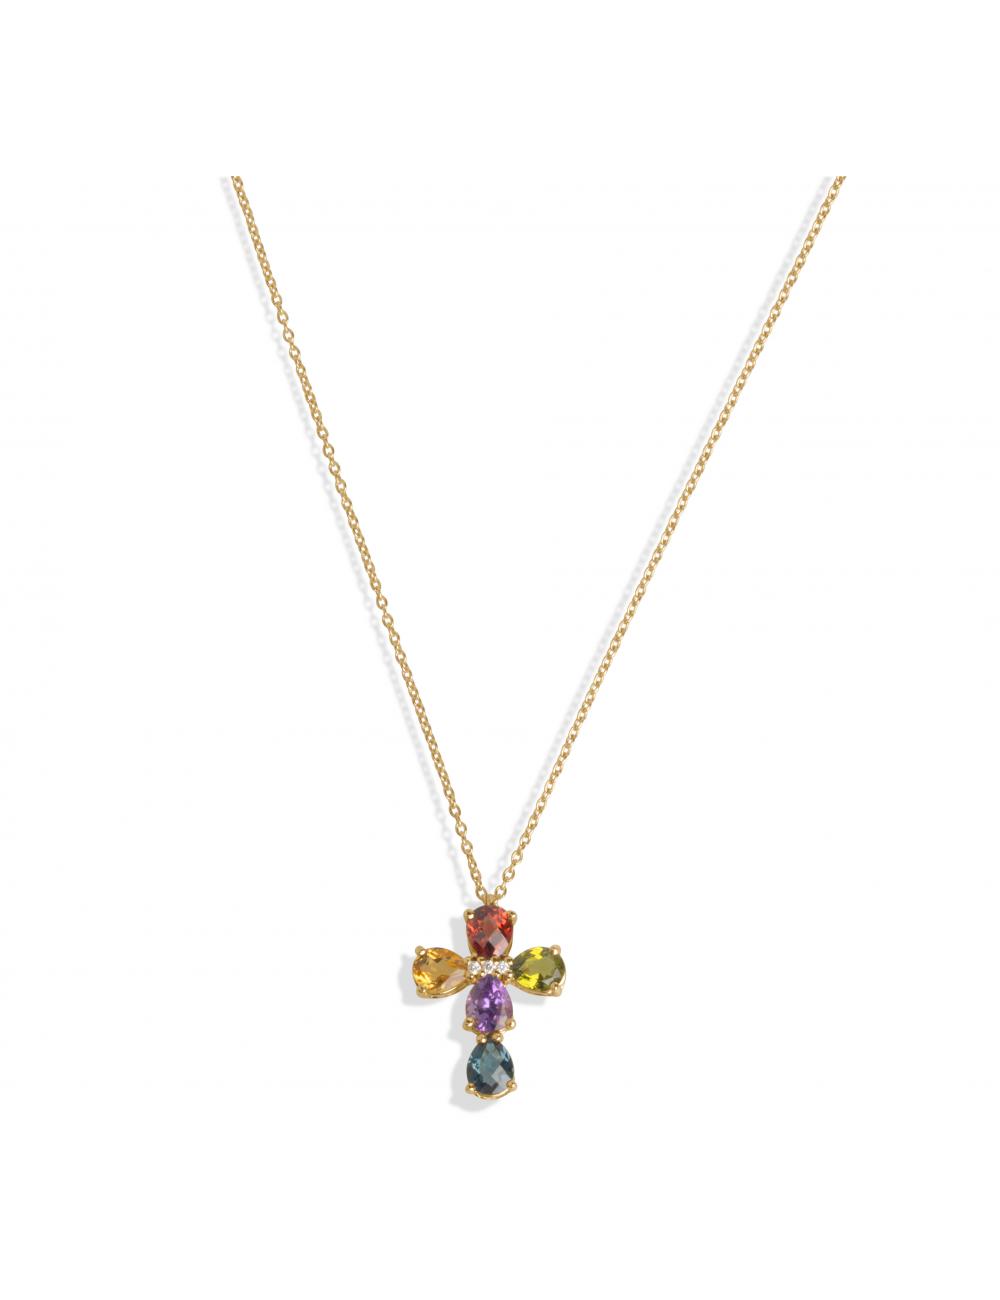 -Collar oro rosa con Brillantes, Topacio London azul, Granate, Citrino, Peridoto y Amatista -A01-50/30MIX4-43:03